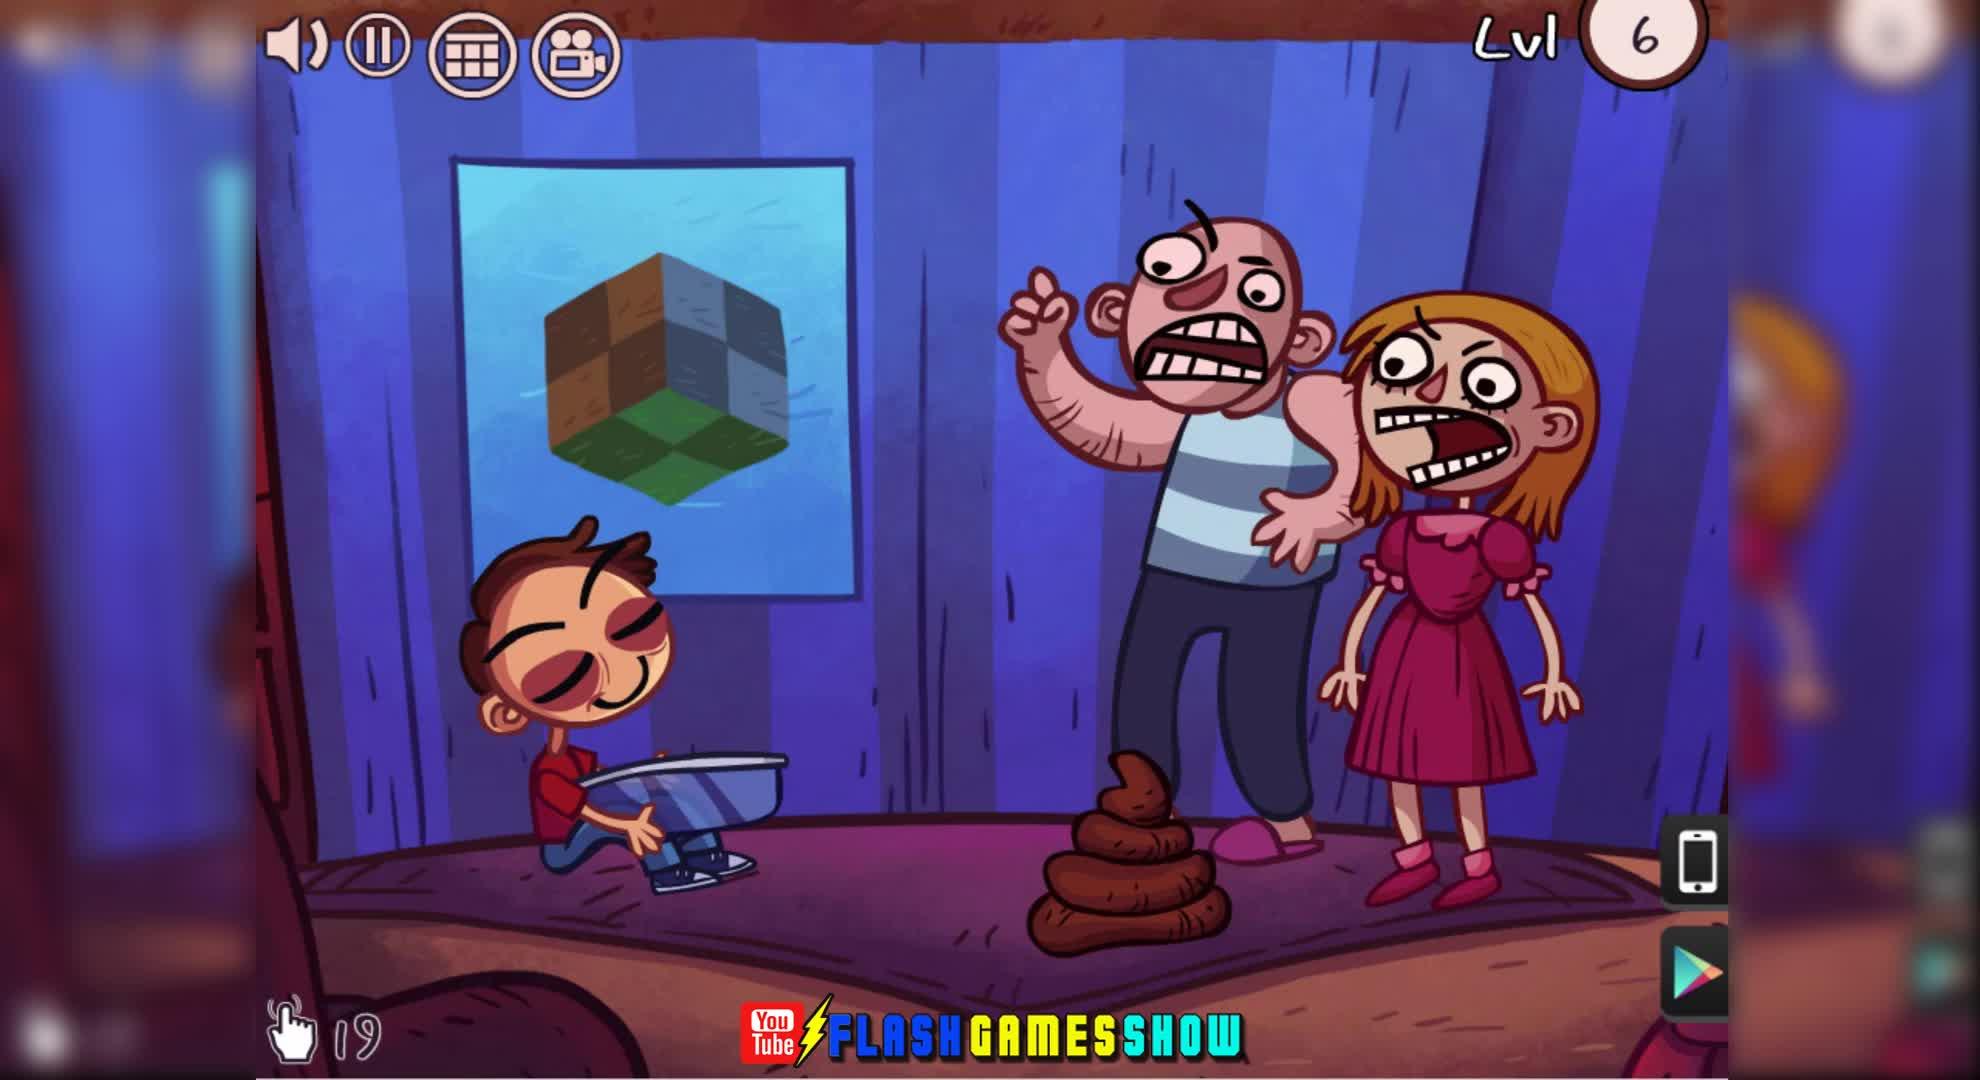 Troll Face Quest Video Games Walkthrough Video Watch at Y8